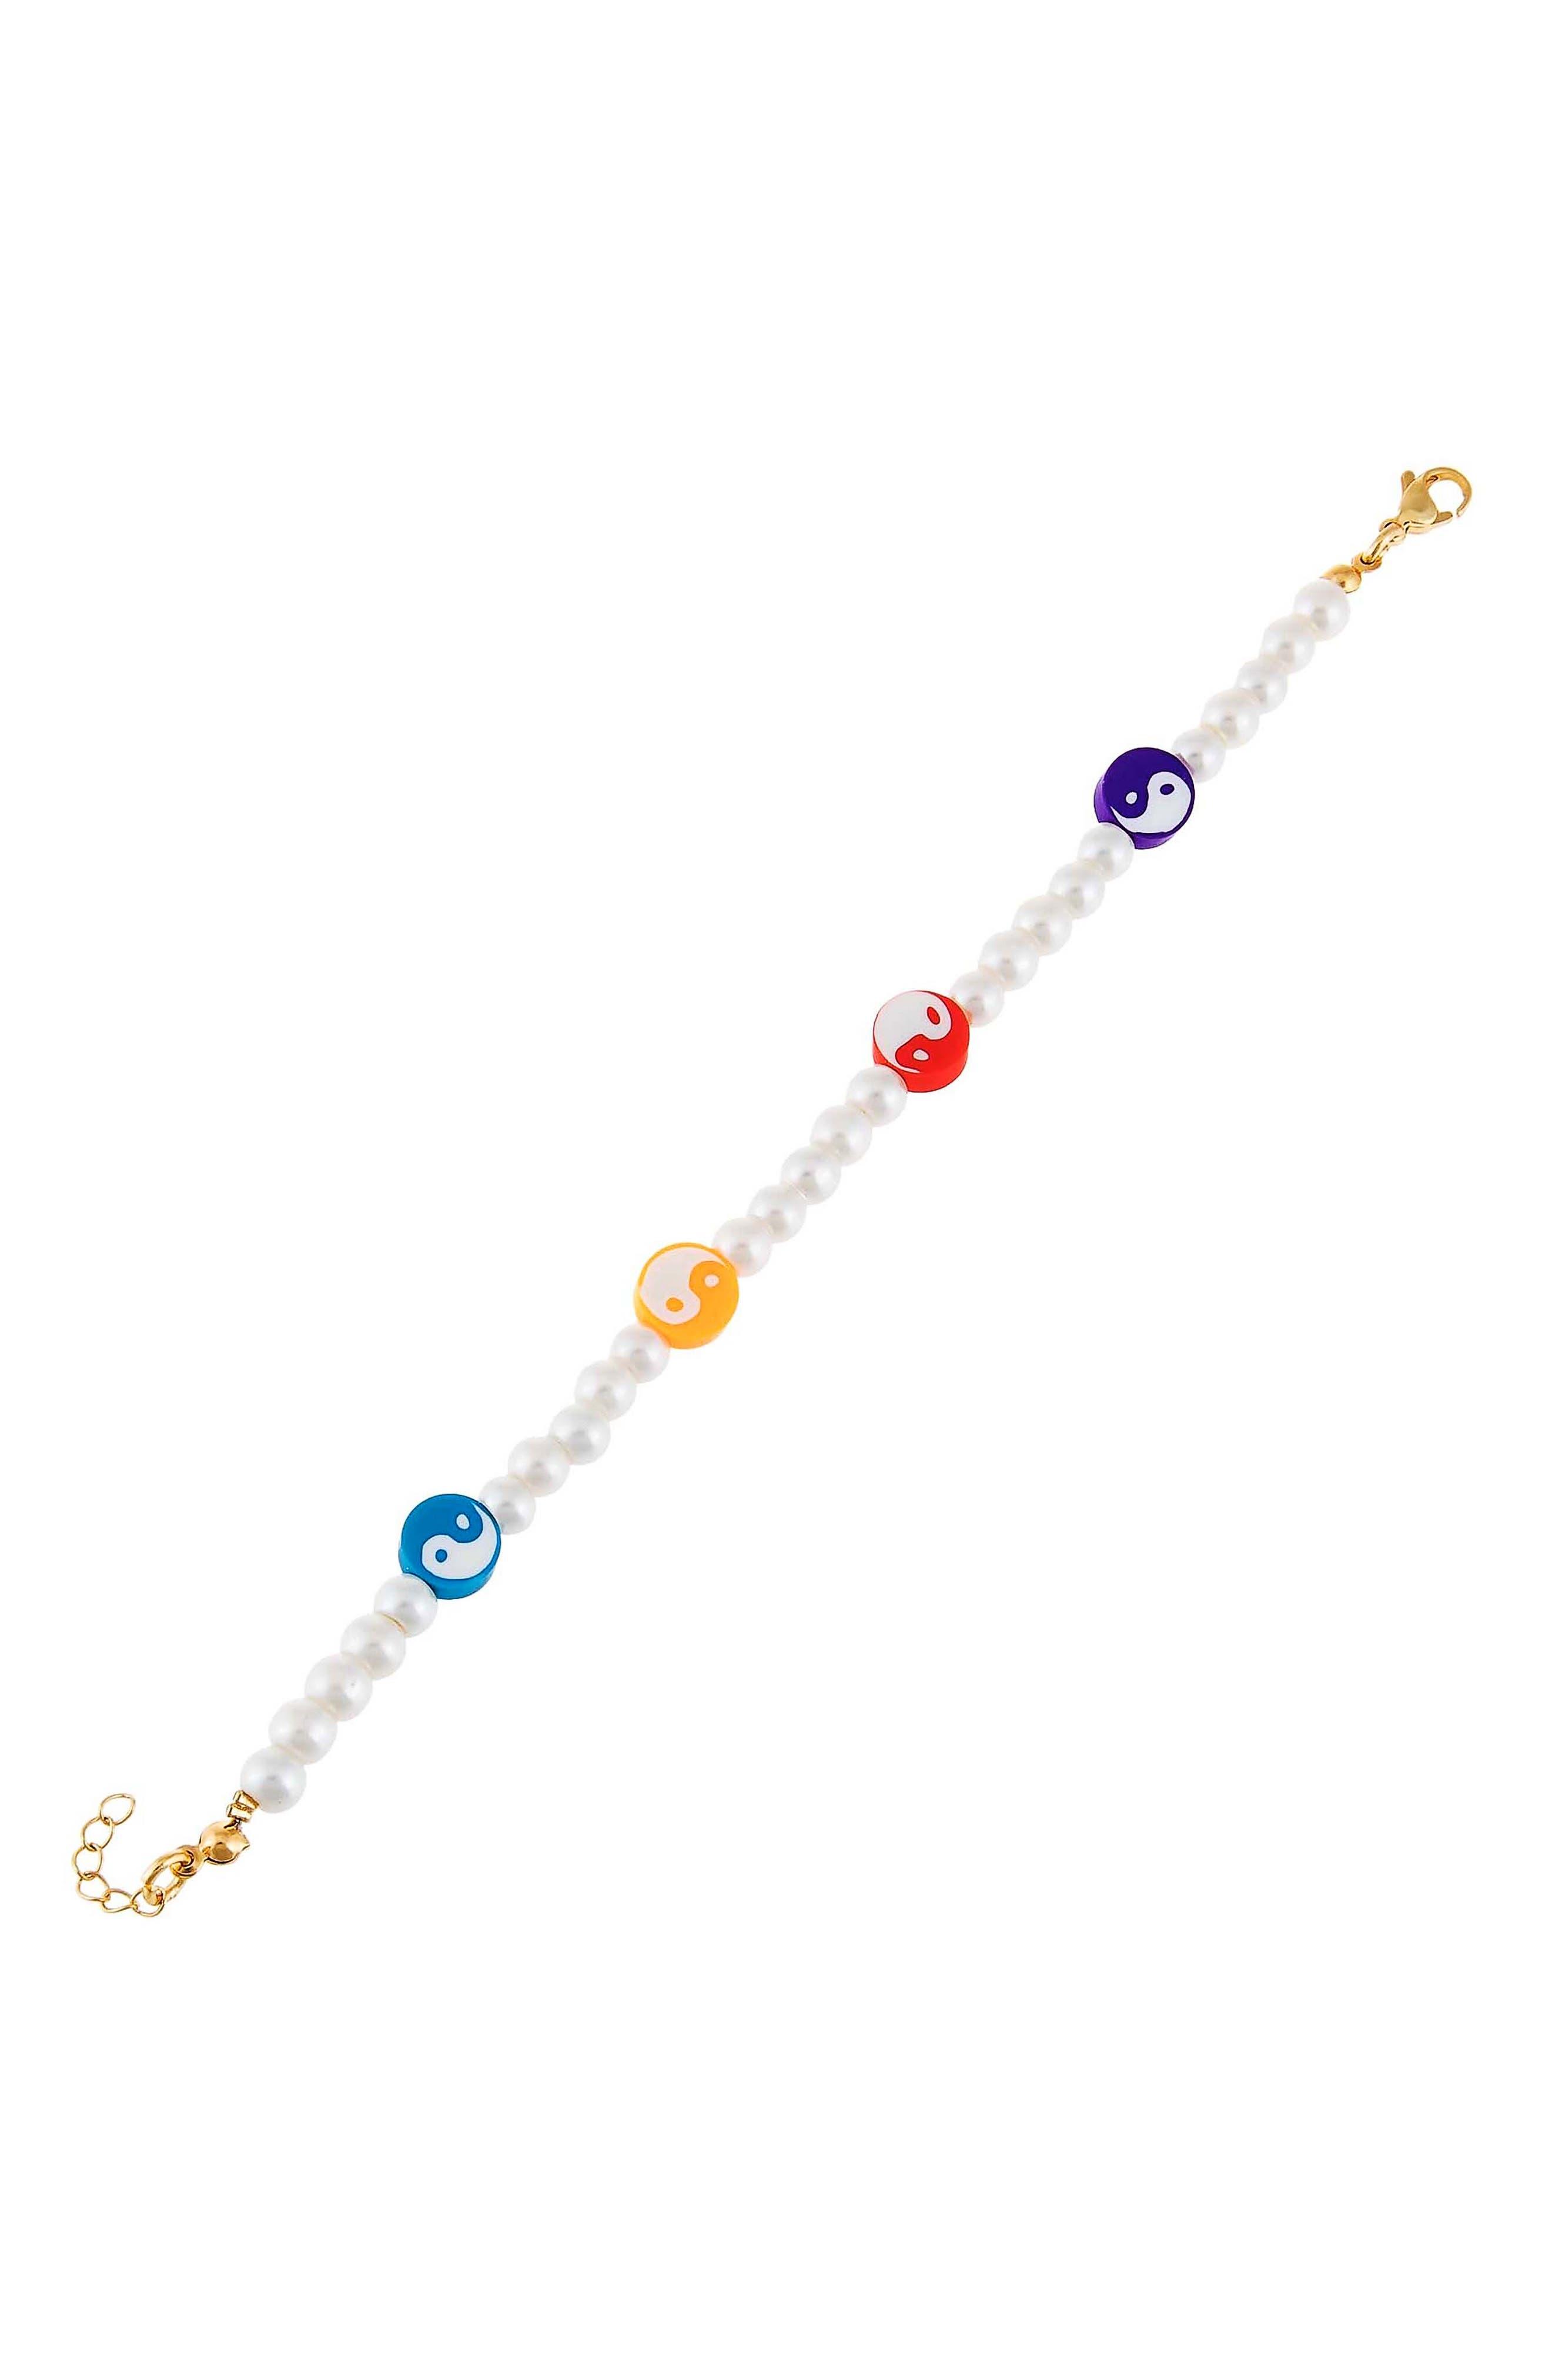 Women's Adina's Jewels Yin Yang Imitation Pearl Bracelet